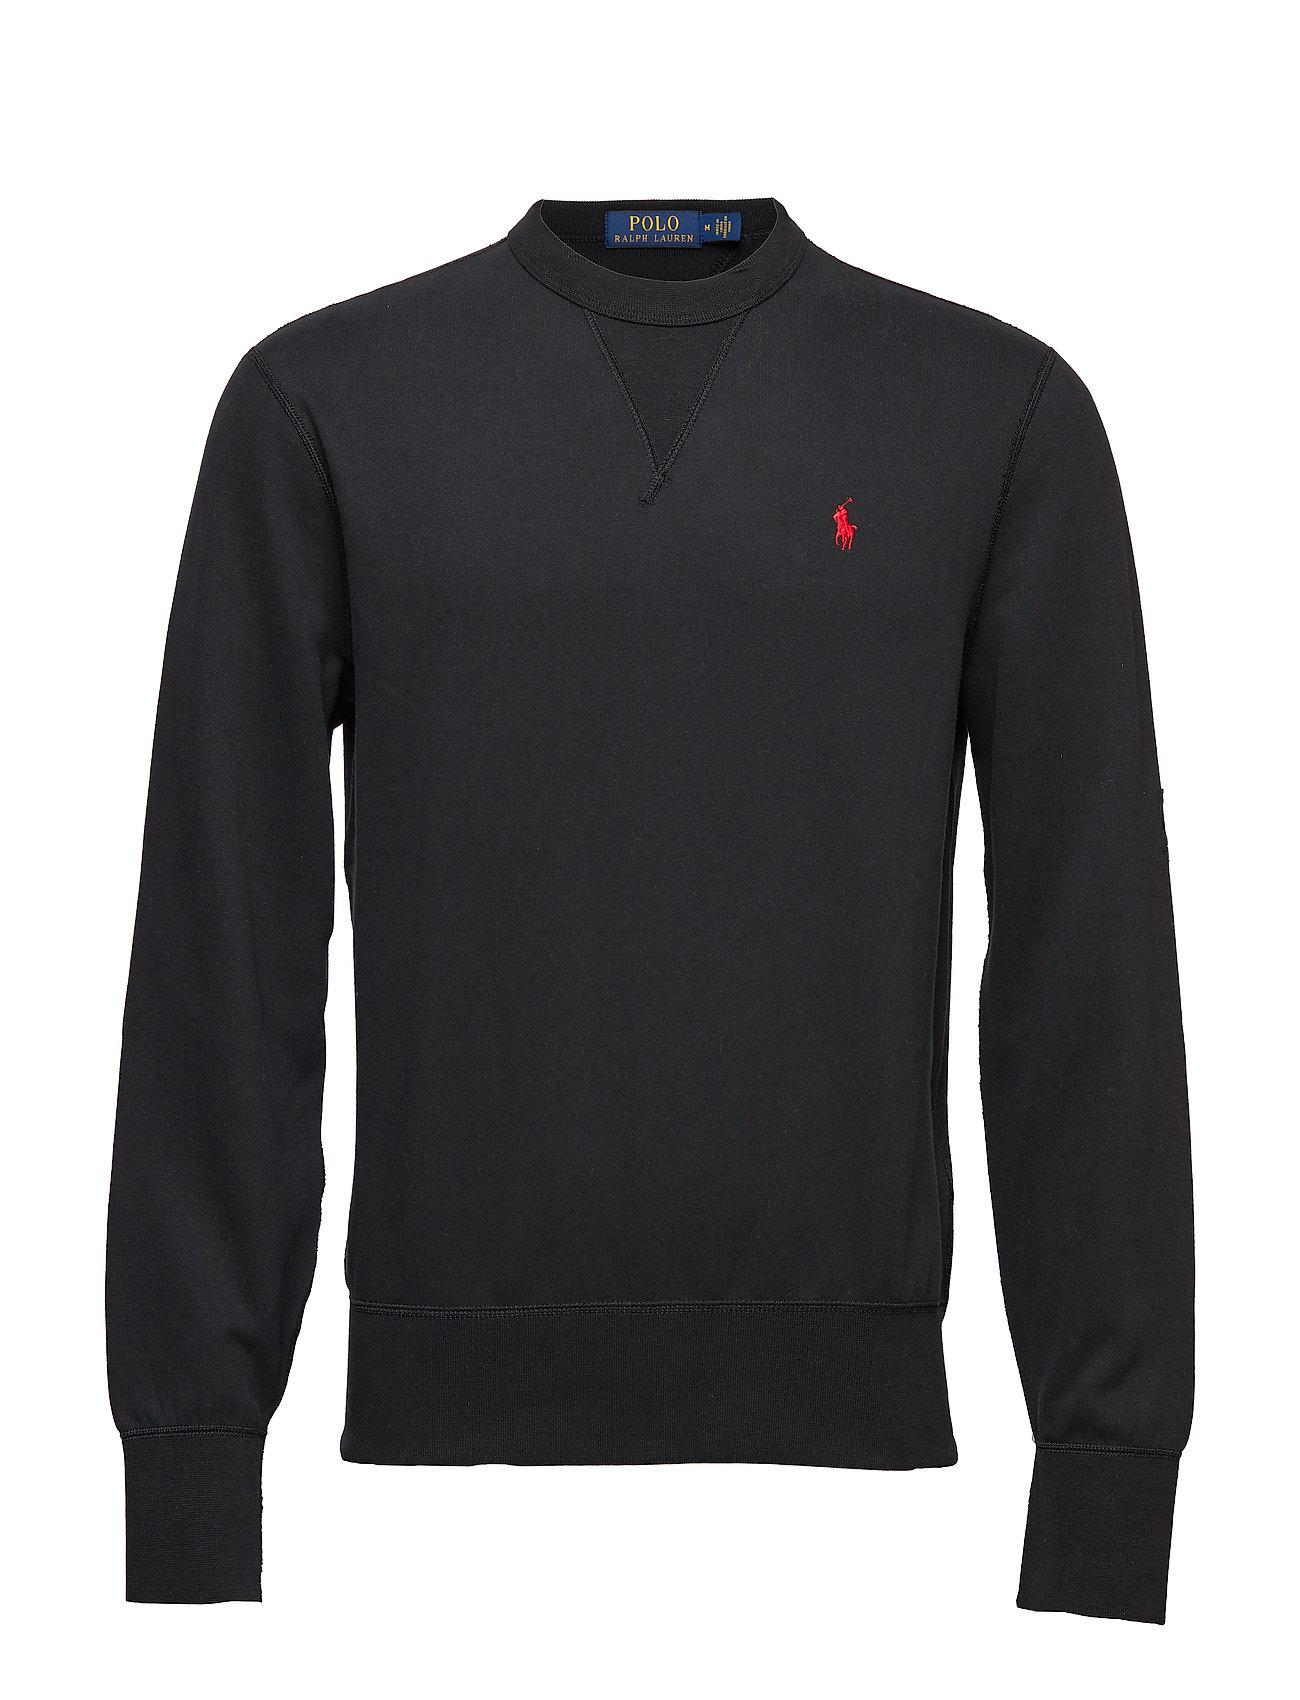 Ralph BlackPolo Sweatshirtpolo Lauren Cotton blend fleece P8knOX0w